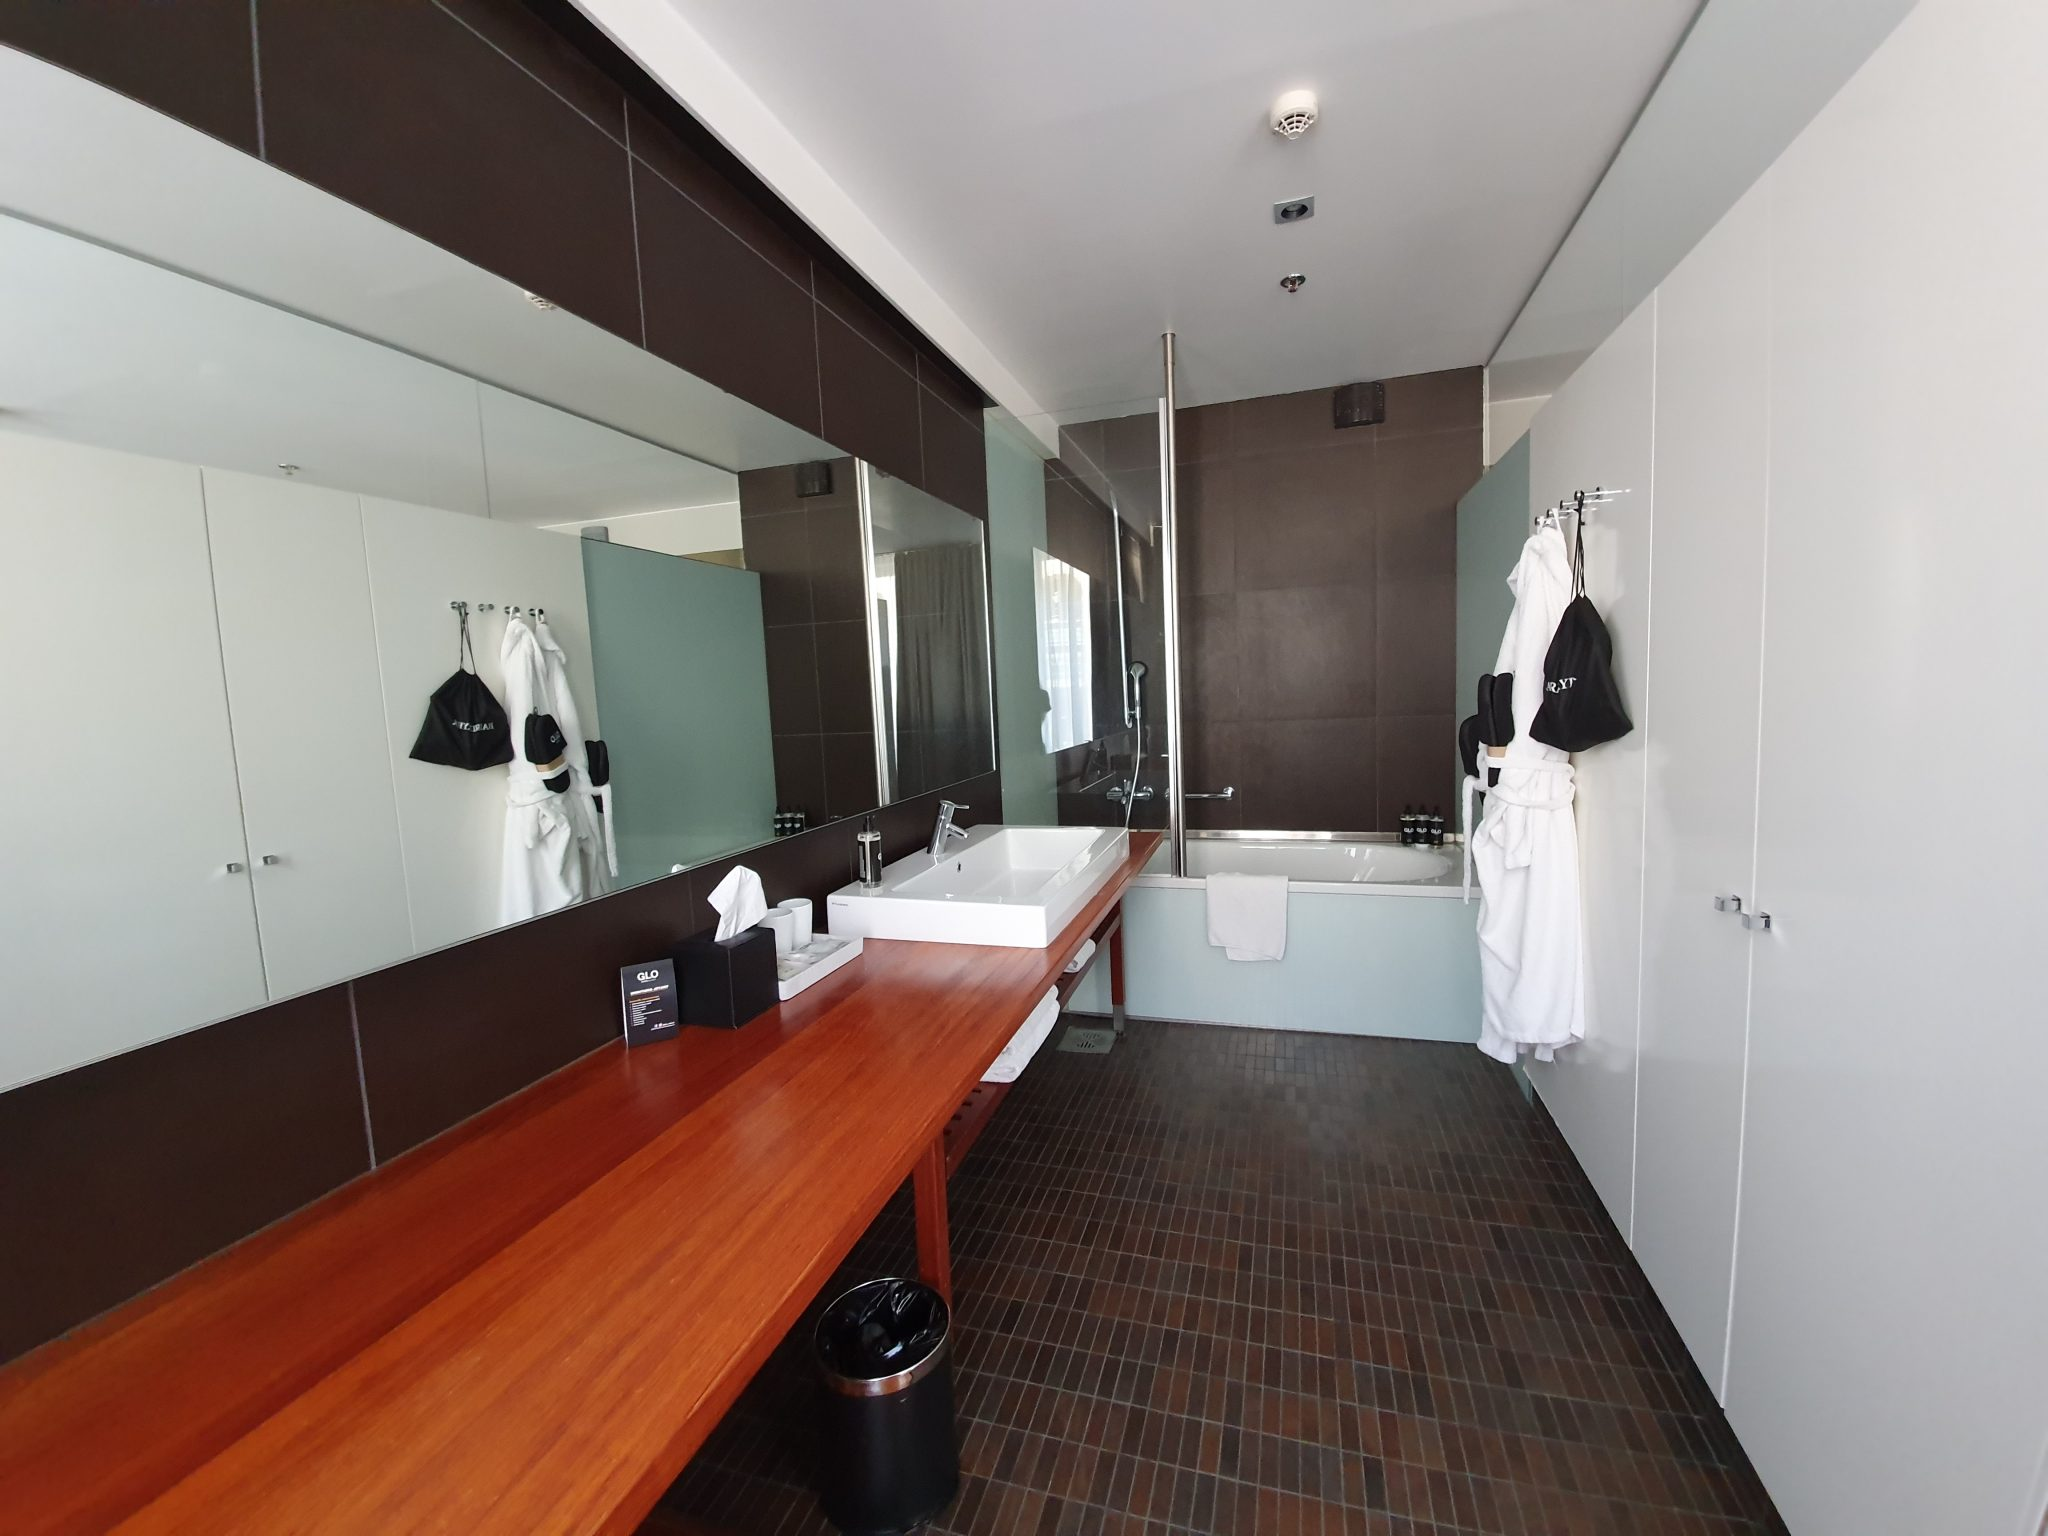 GLO kylpyhuone